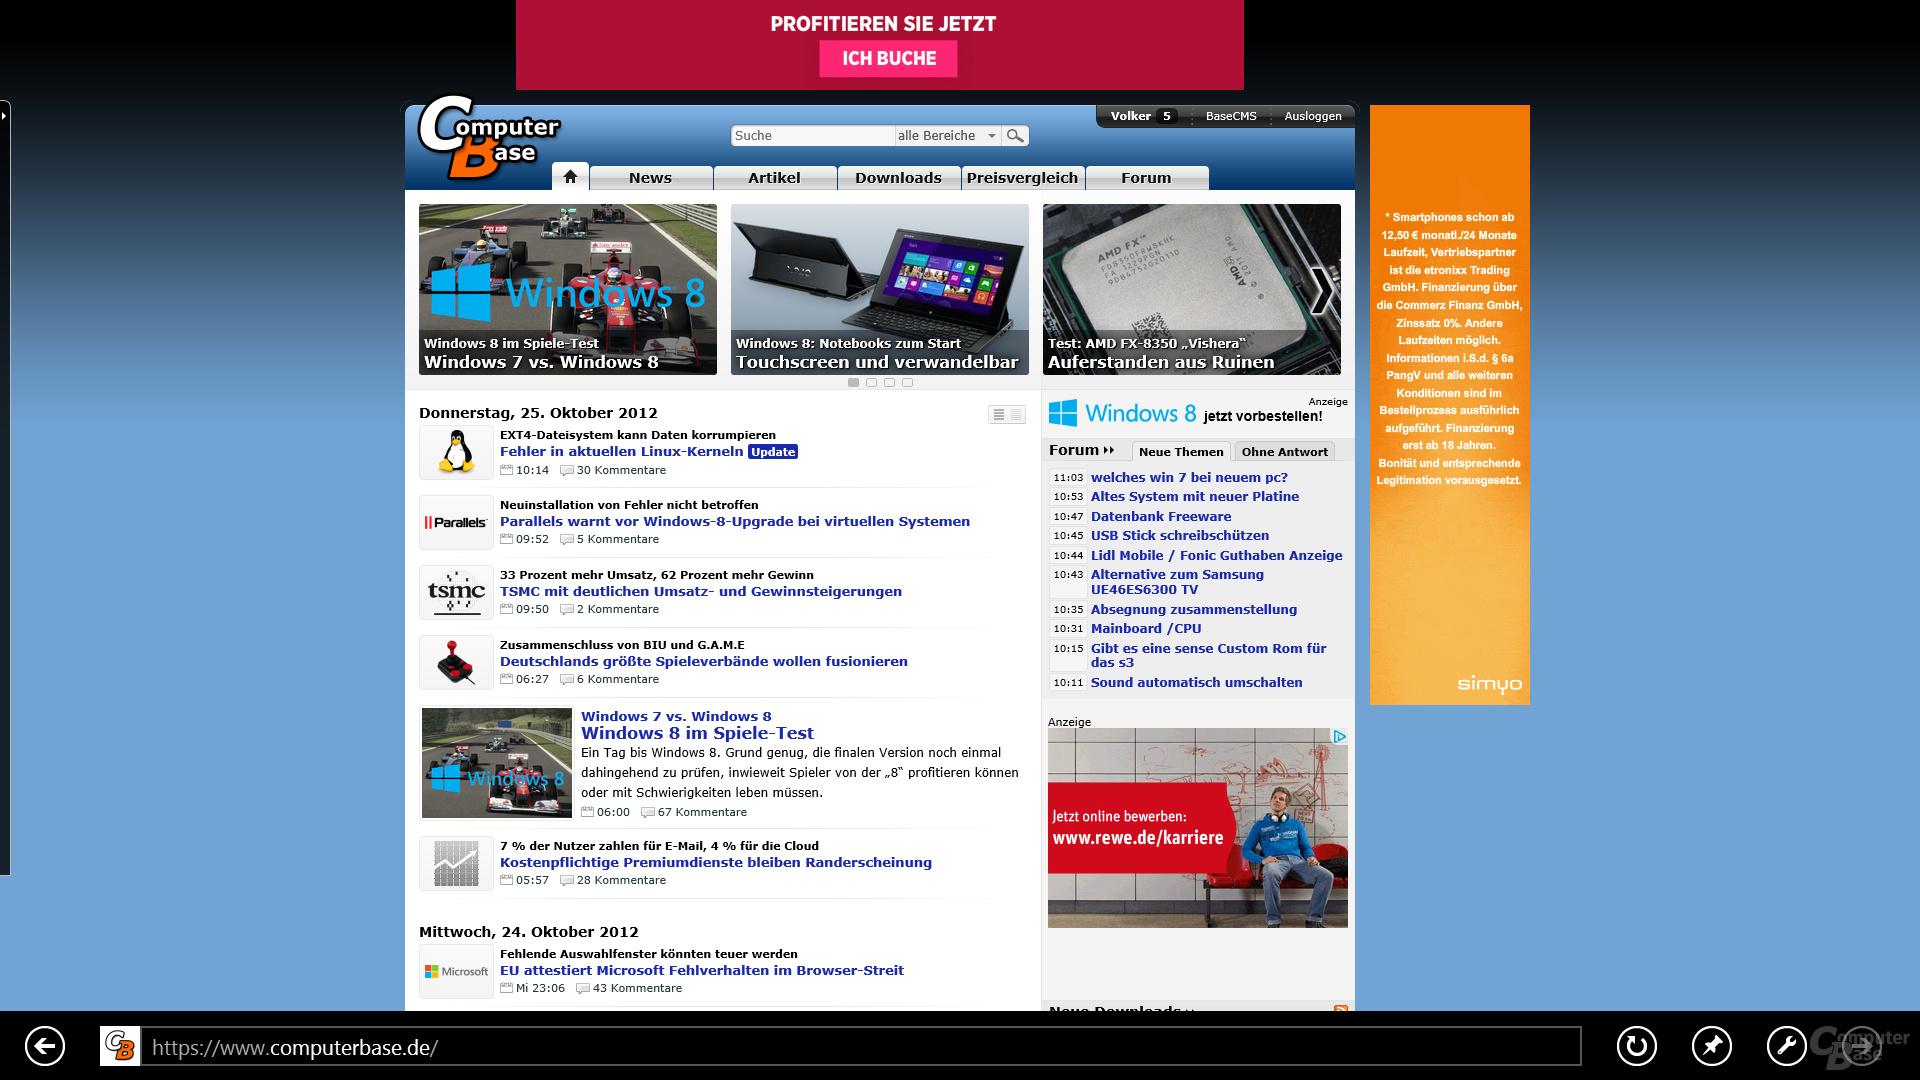 Internet Explorer 10 unter Modern UI